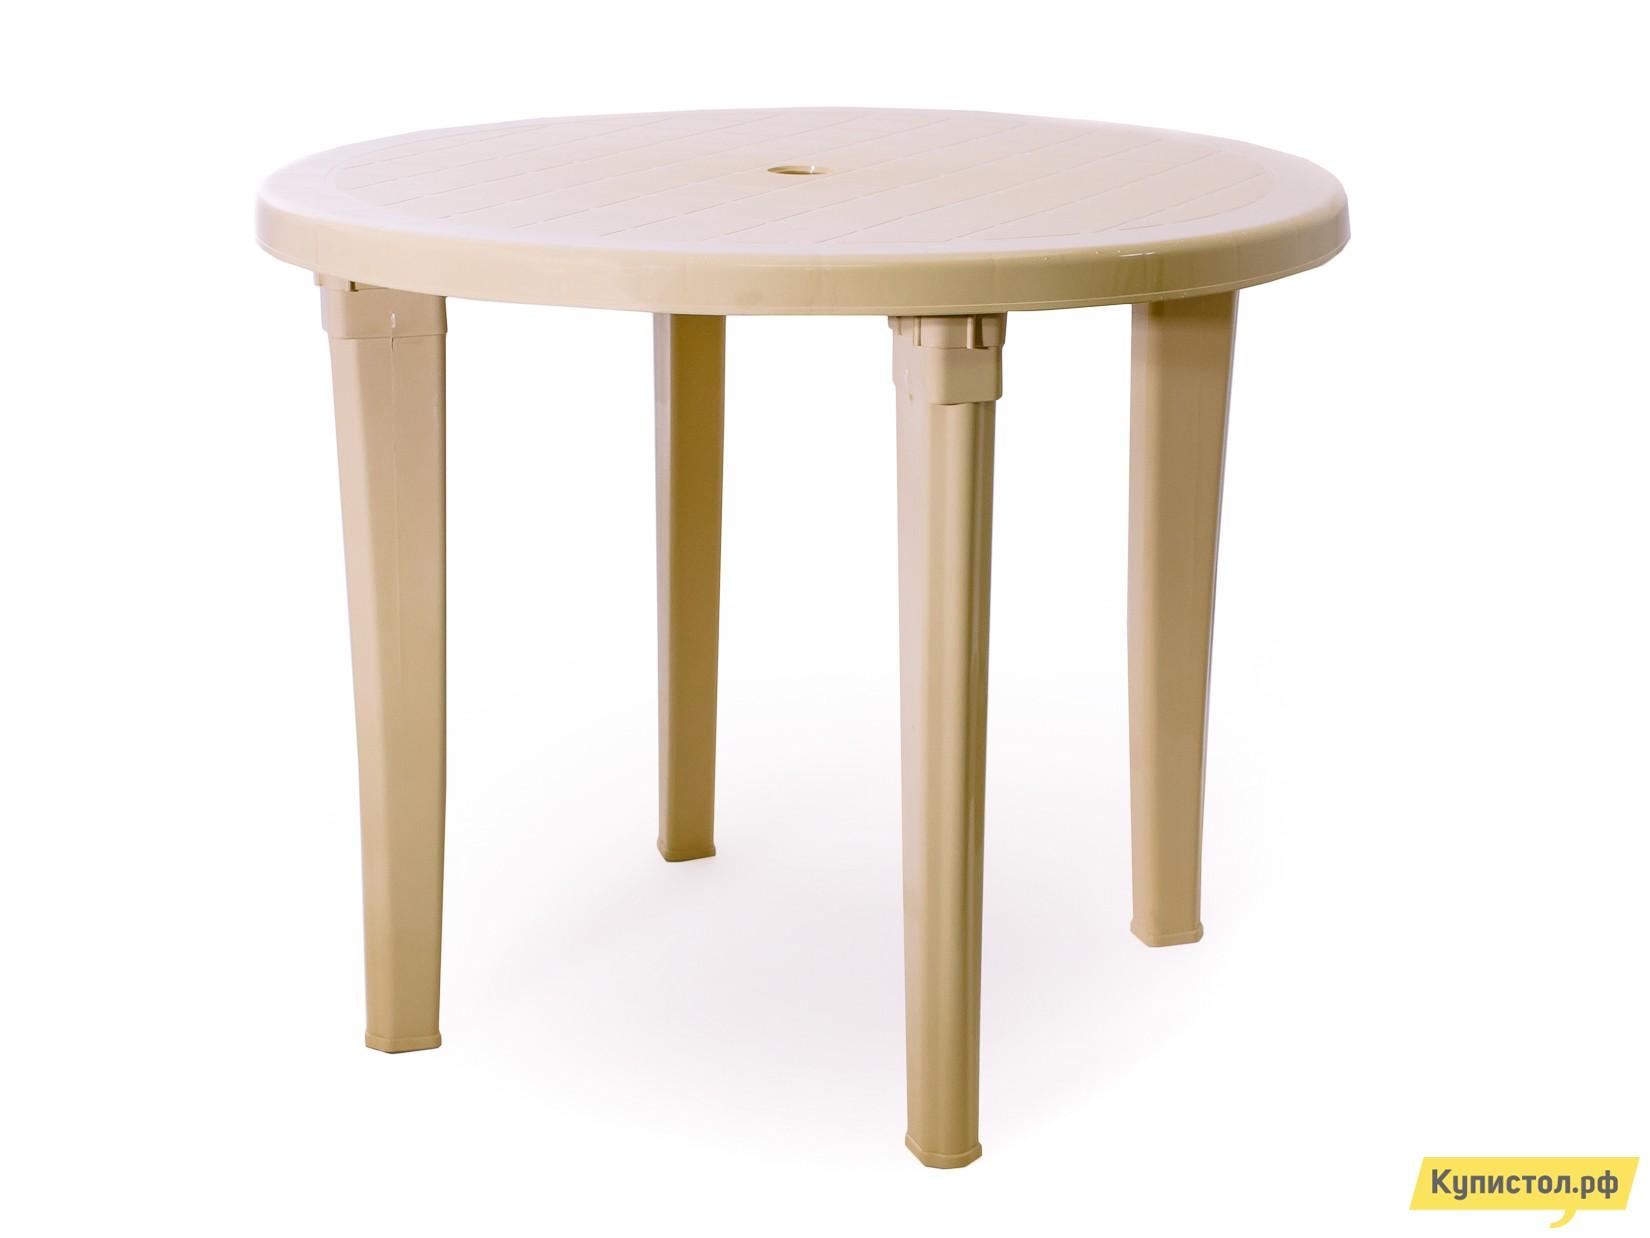 Пластиковый стол ЭЛП Стол круглый Бежевый